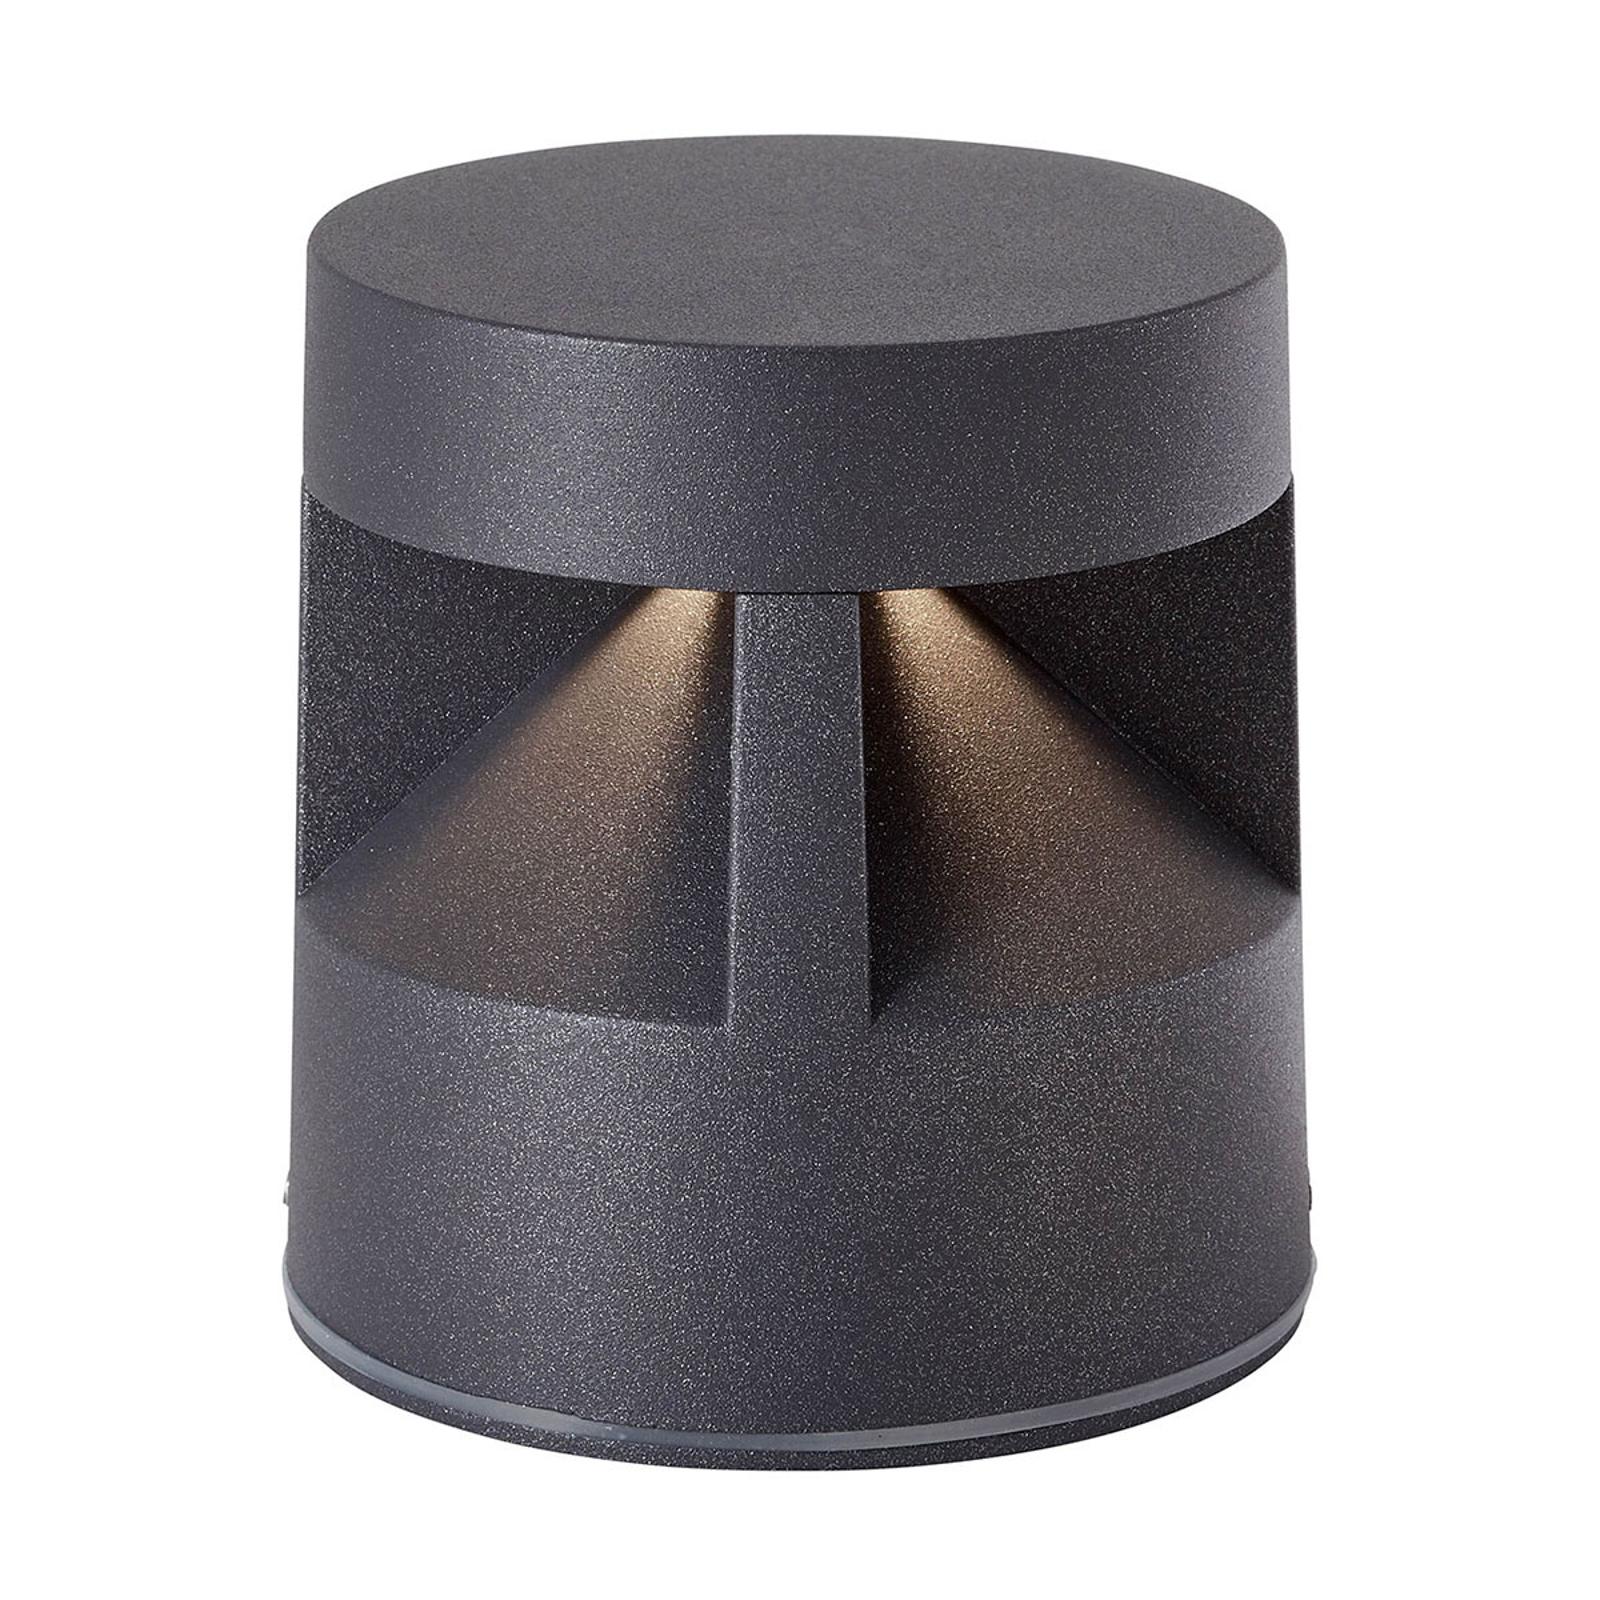 AEG Winslow LED-Sockelleuchte, Höhe 11,5 cm